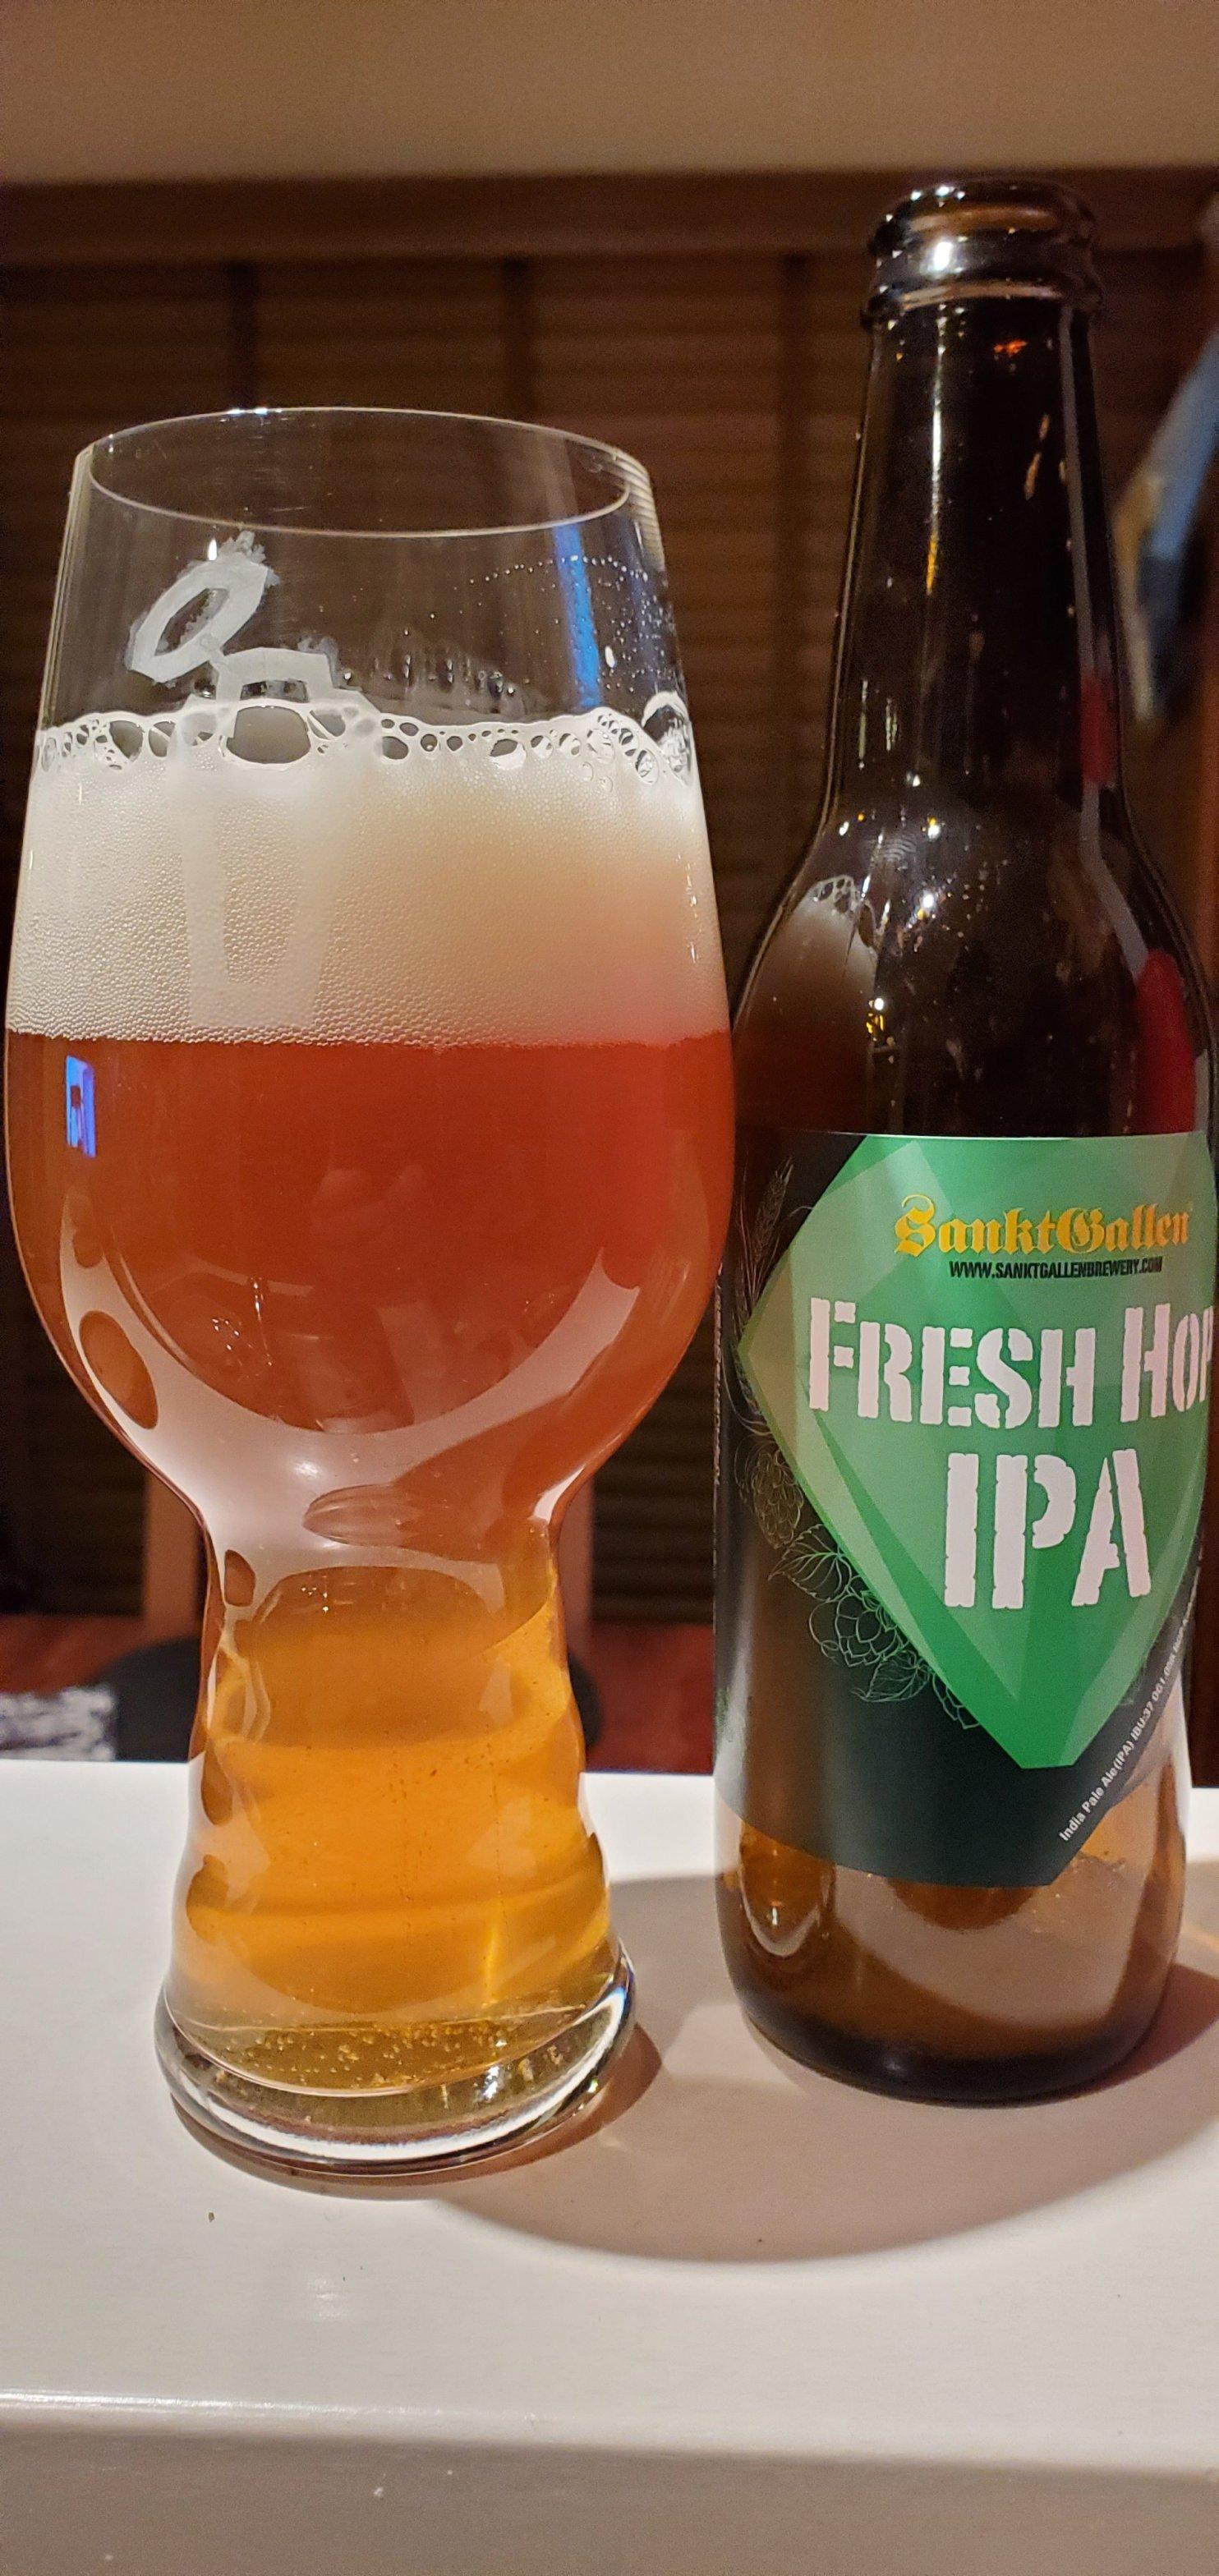 Sankt Gallen Fresh Hop IPA 1・サンクトガーレンフレッシュホップIPA1